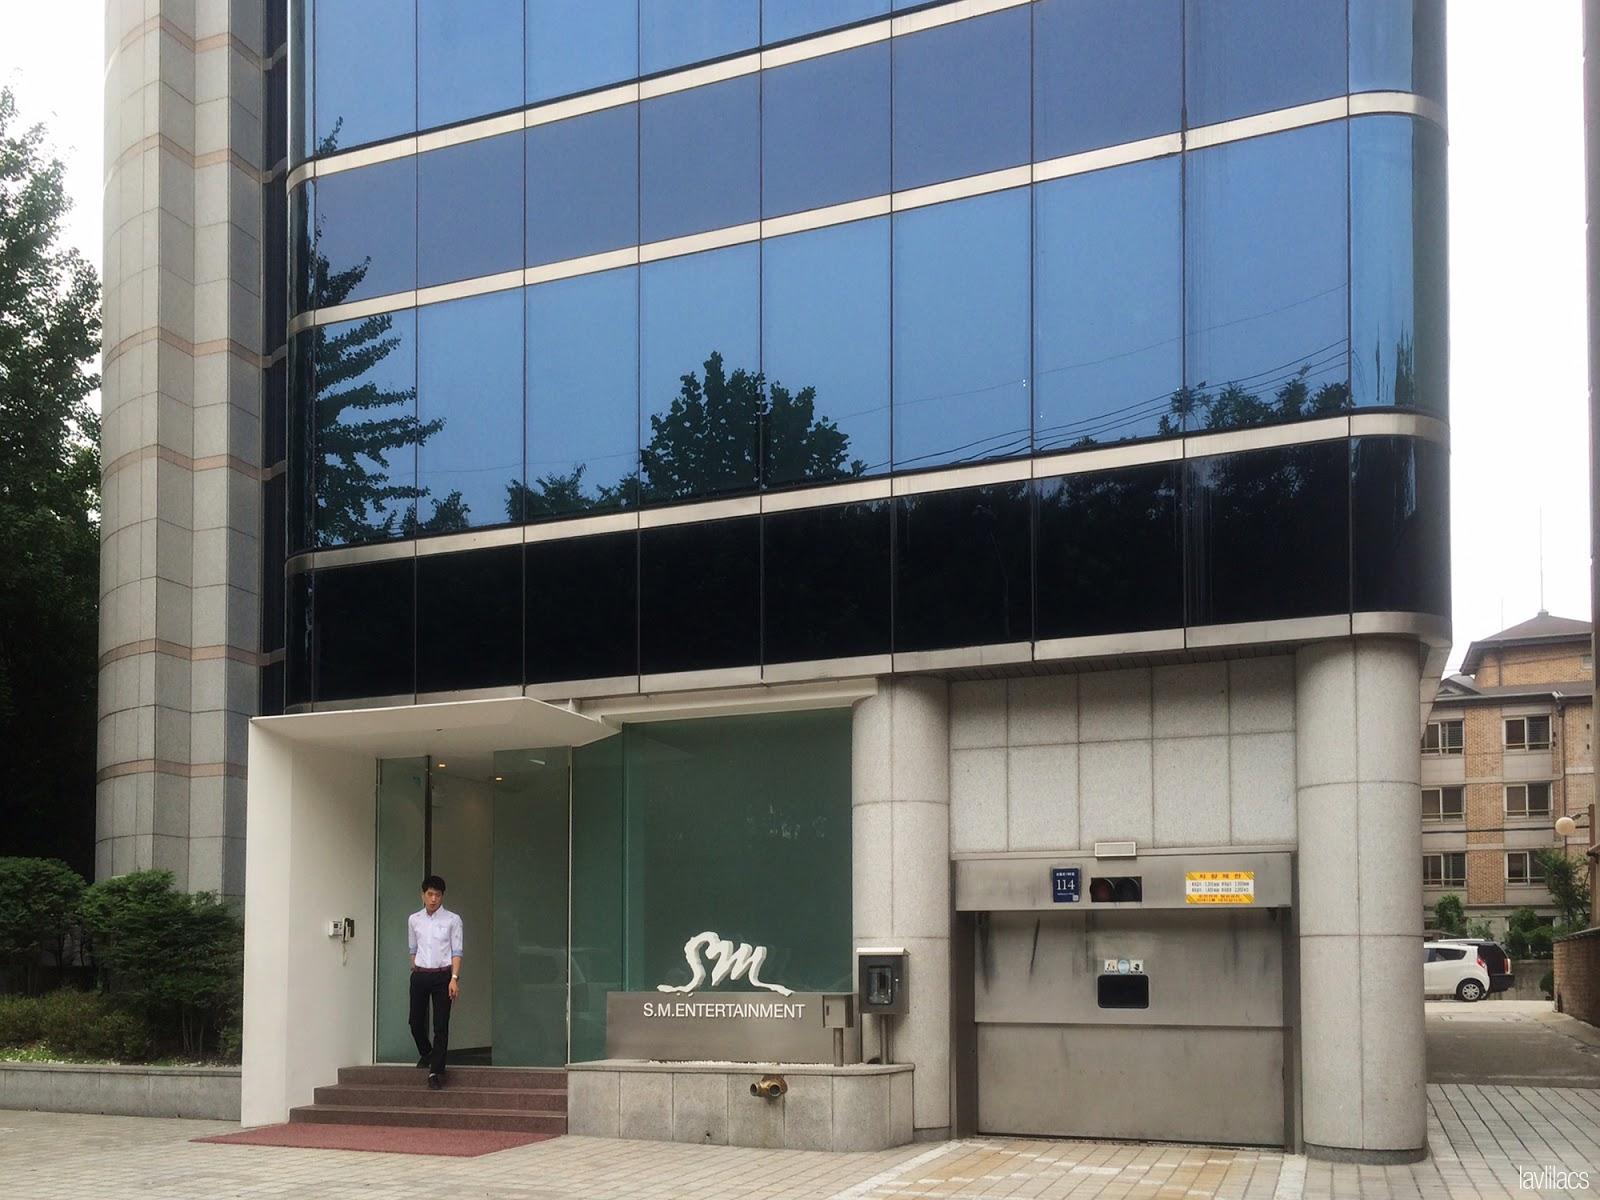 Seoul, Korea - Summer Study Abroad 2014 - SM Entertainment building